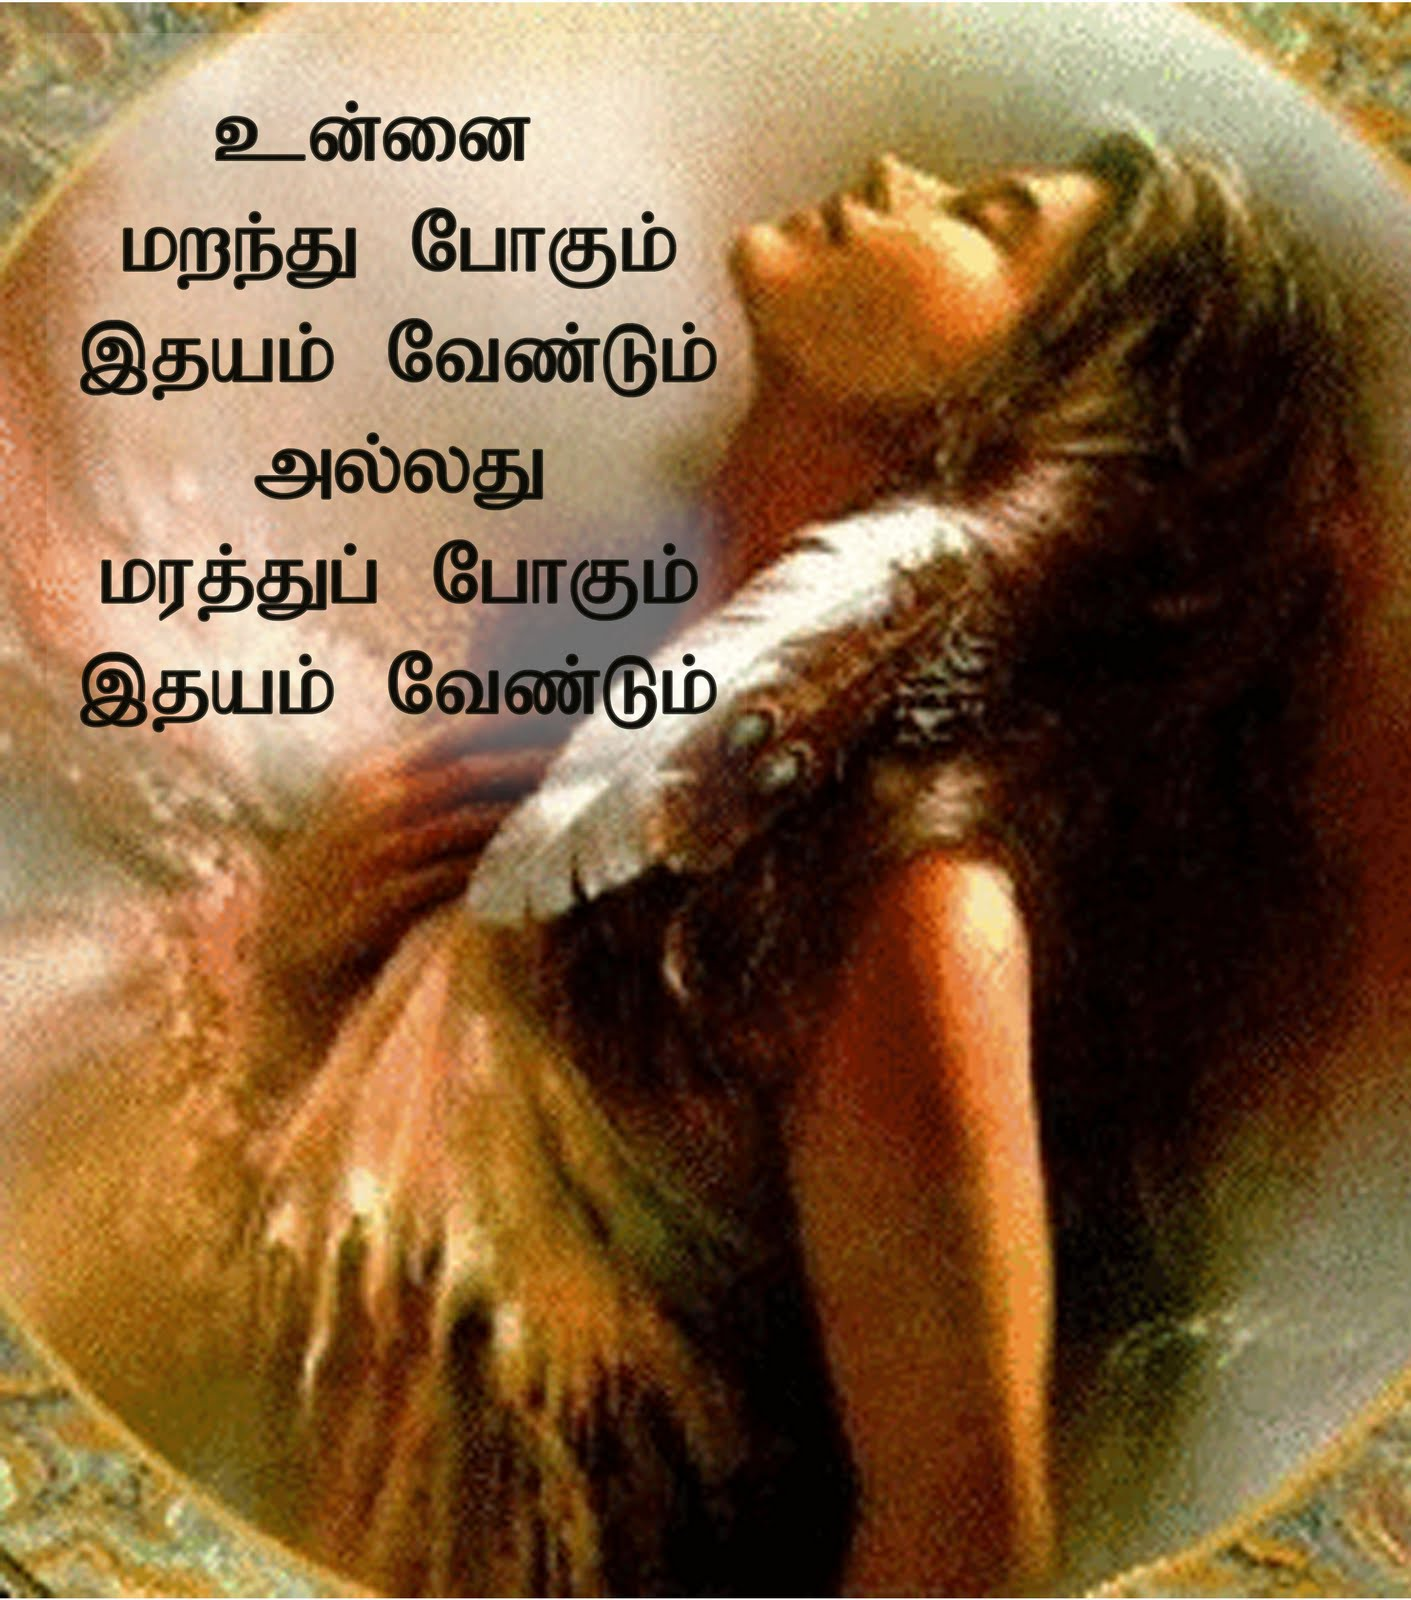 Tamil friendship kavithai photos Tamil Hero Vijay Images download, quot;s, new